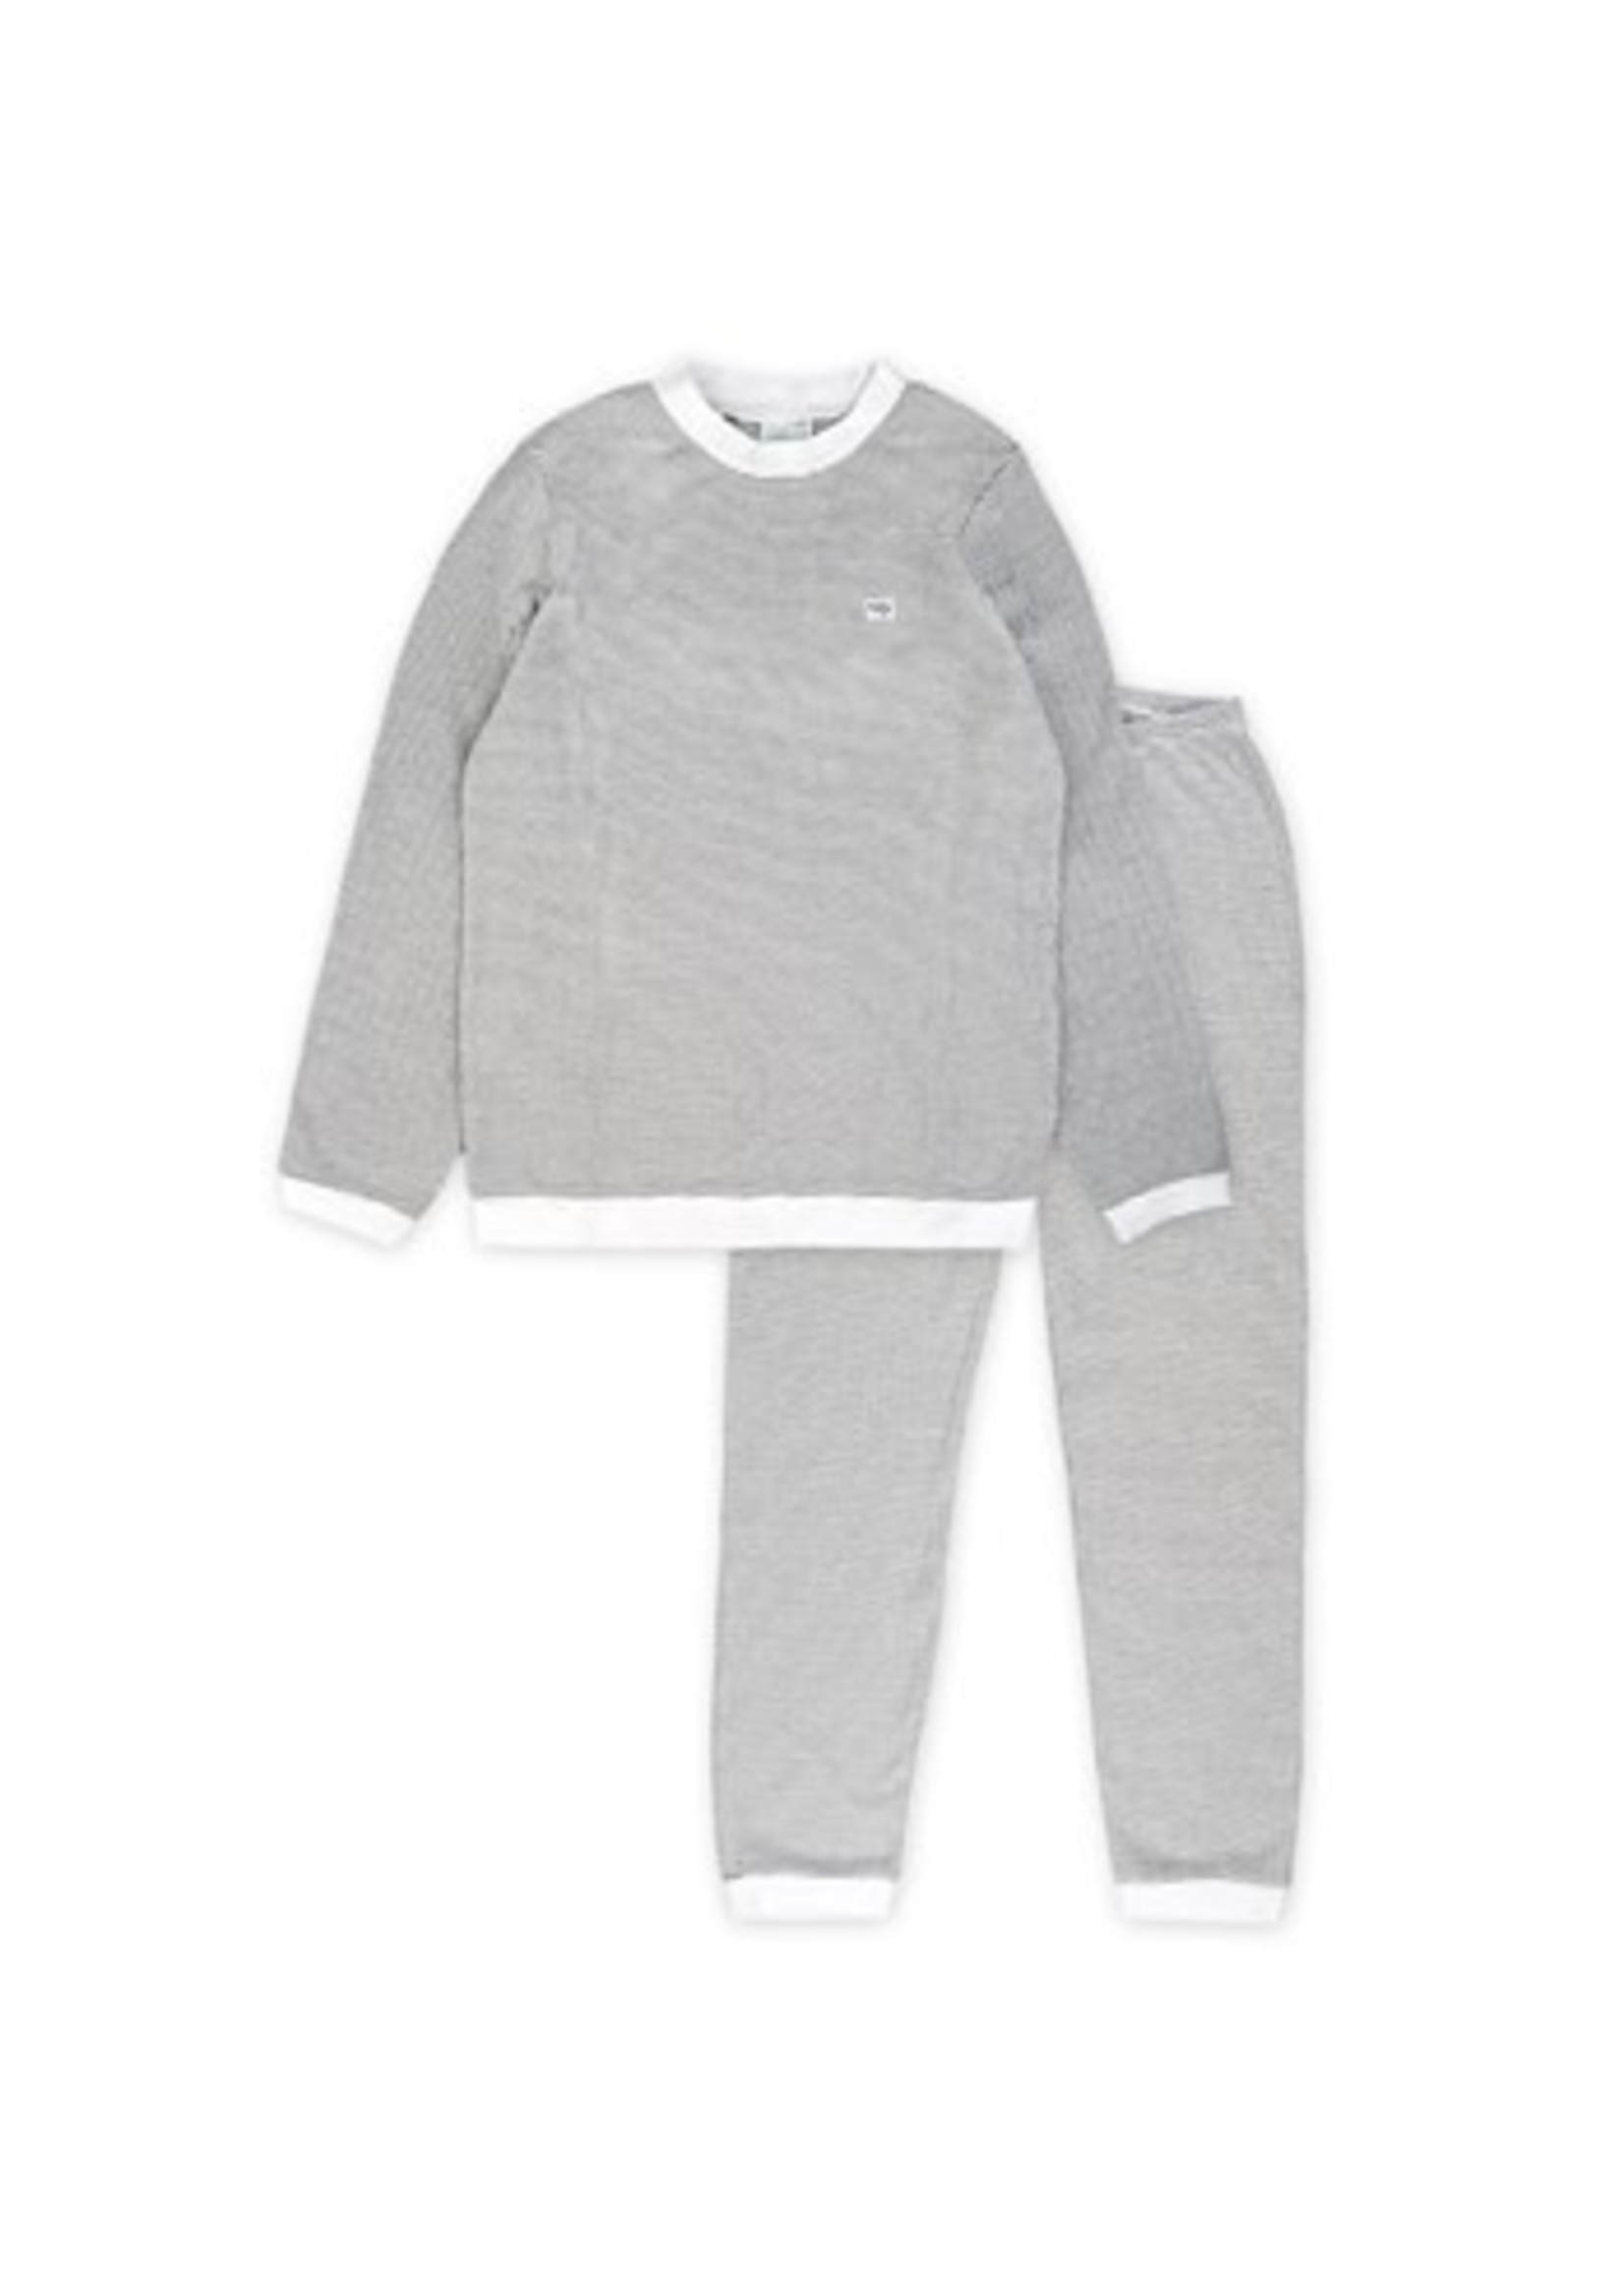 Feetje Pyjama volwassen Family edition